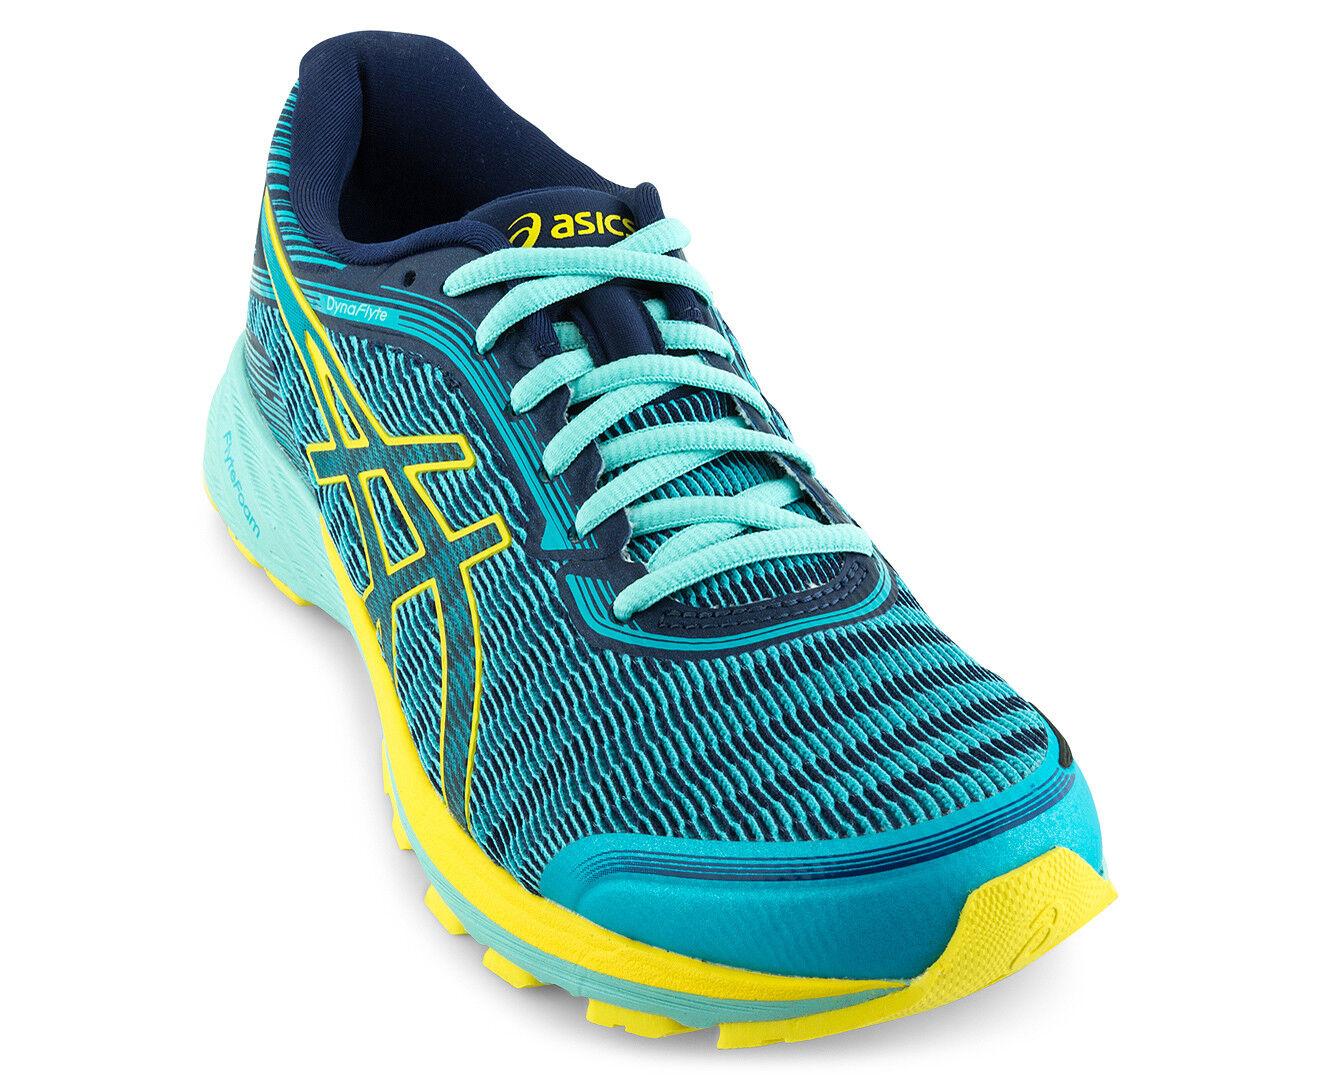 ASICS Women's DynaFlyte Shoe - Blue US 9.5 (OTT587)